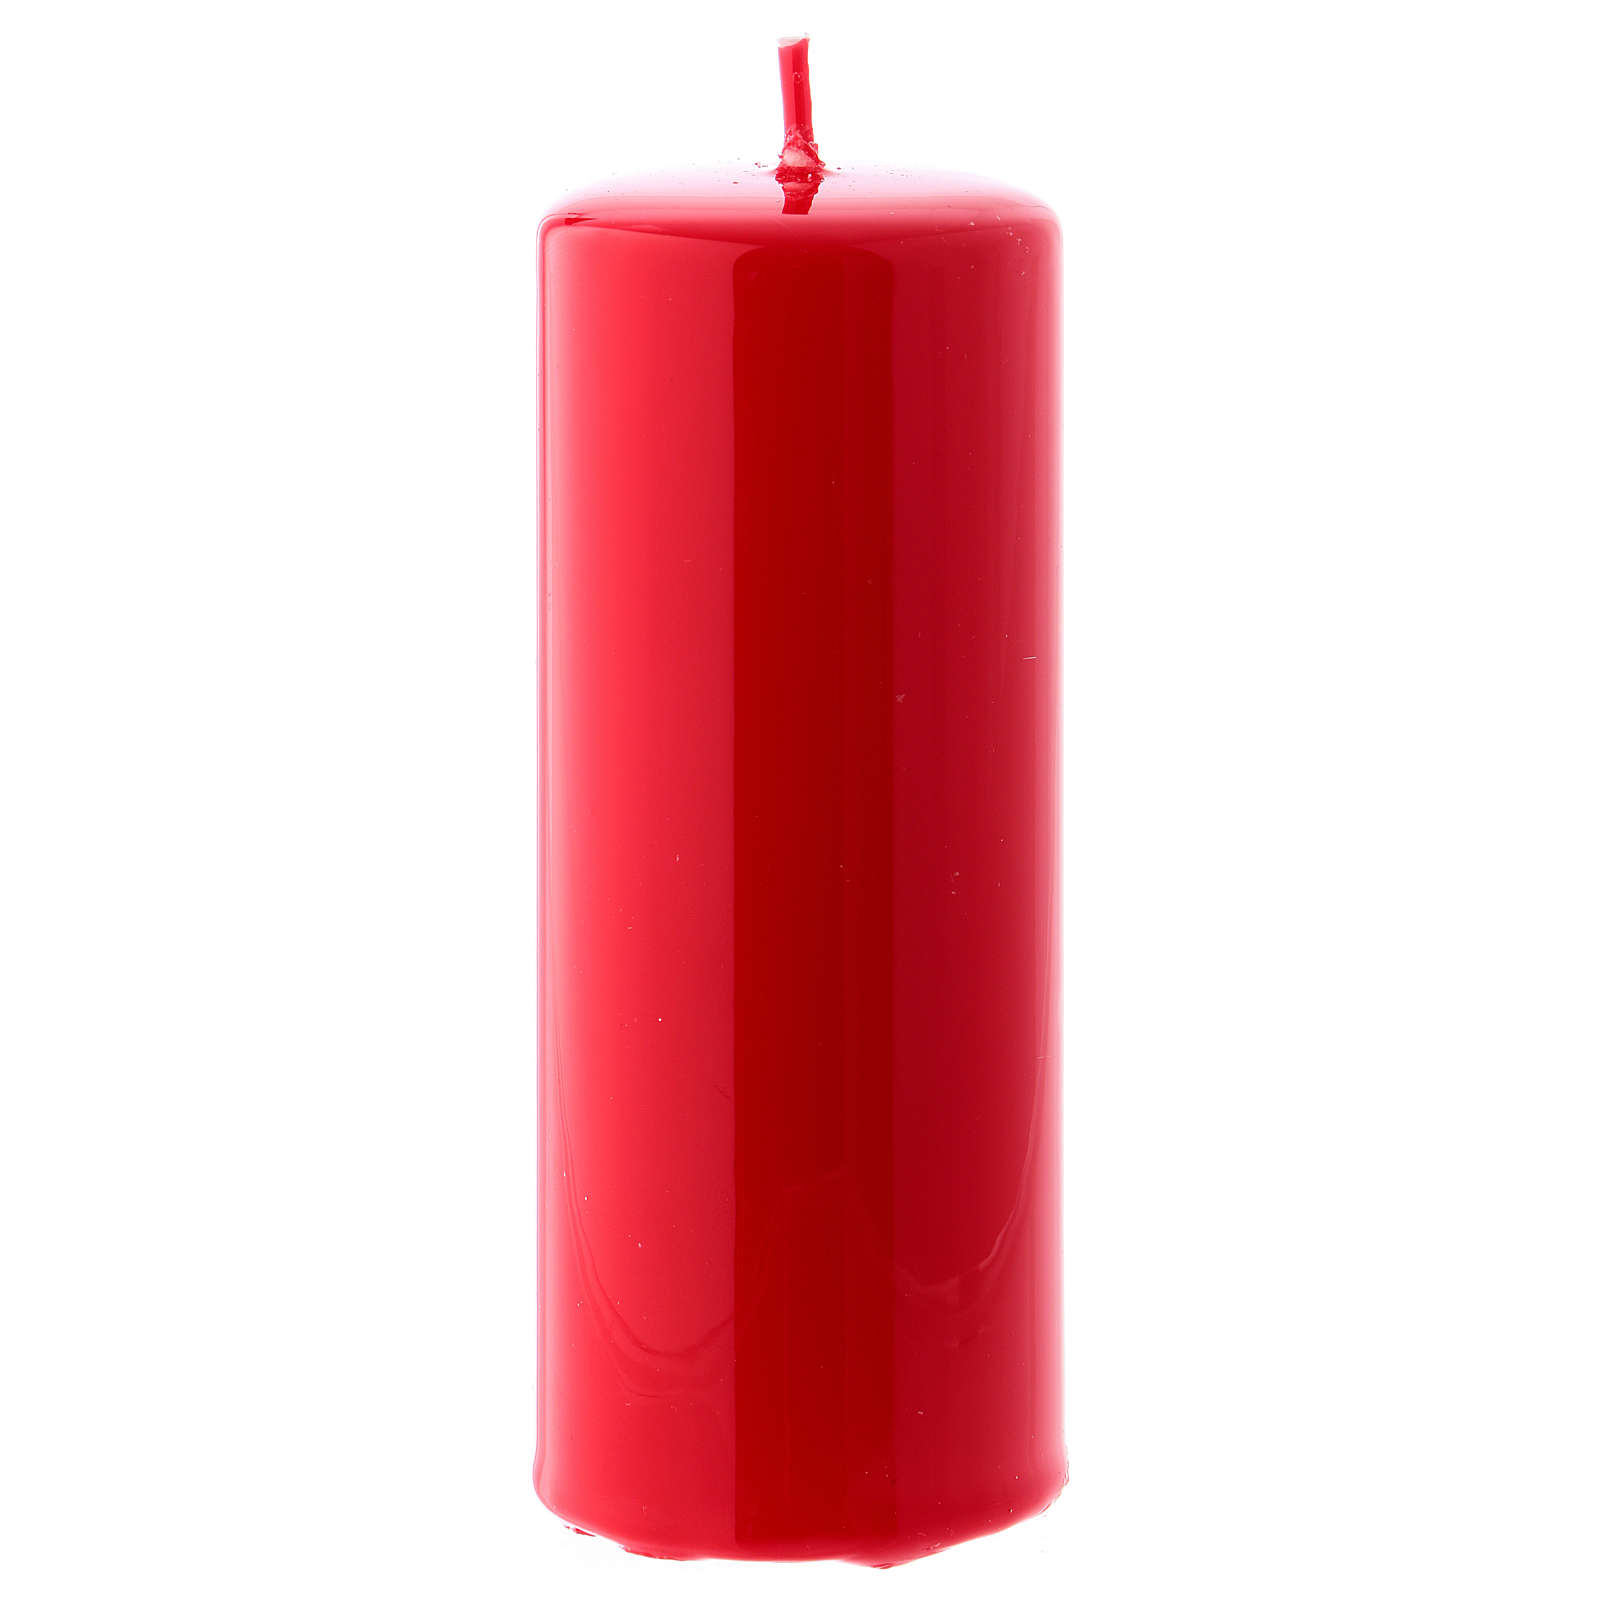 Vela roja Lúcida Lacre 5x13 cm 3